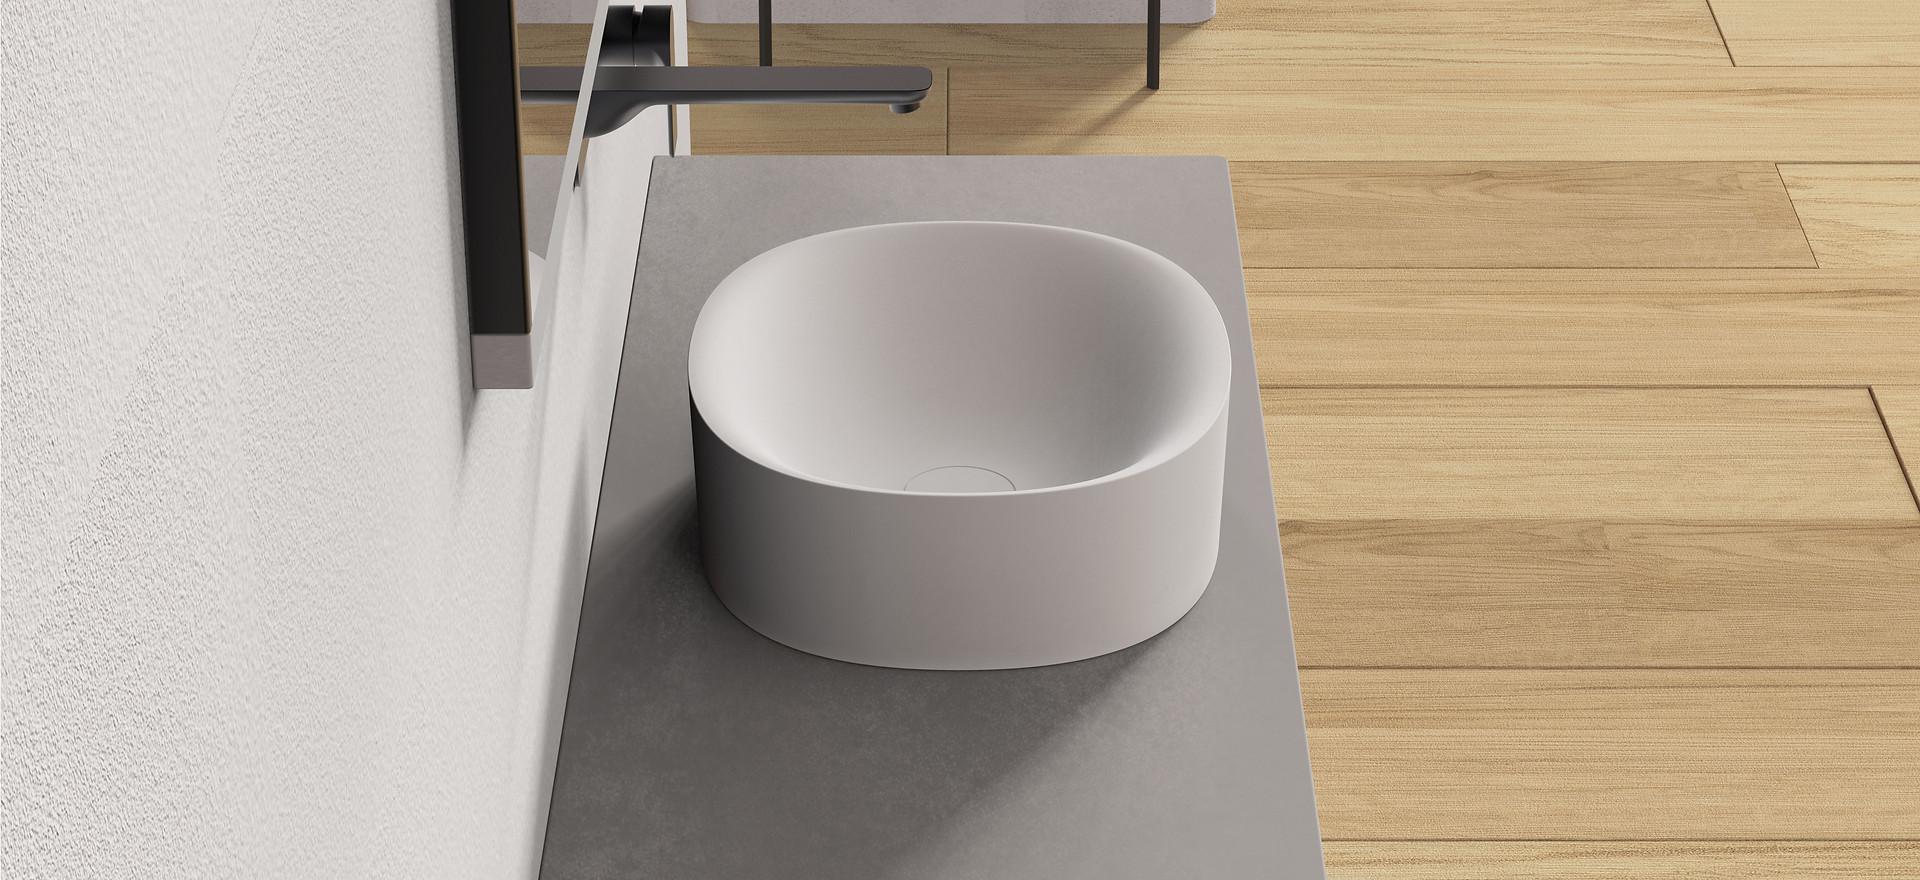 Solidcliff_Basin-400_03.jpg